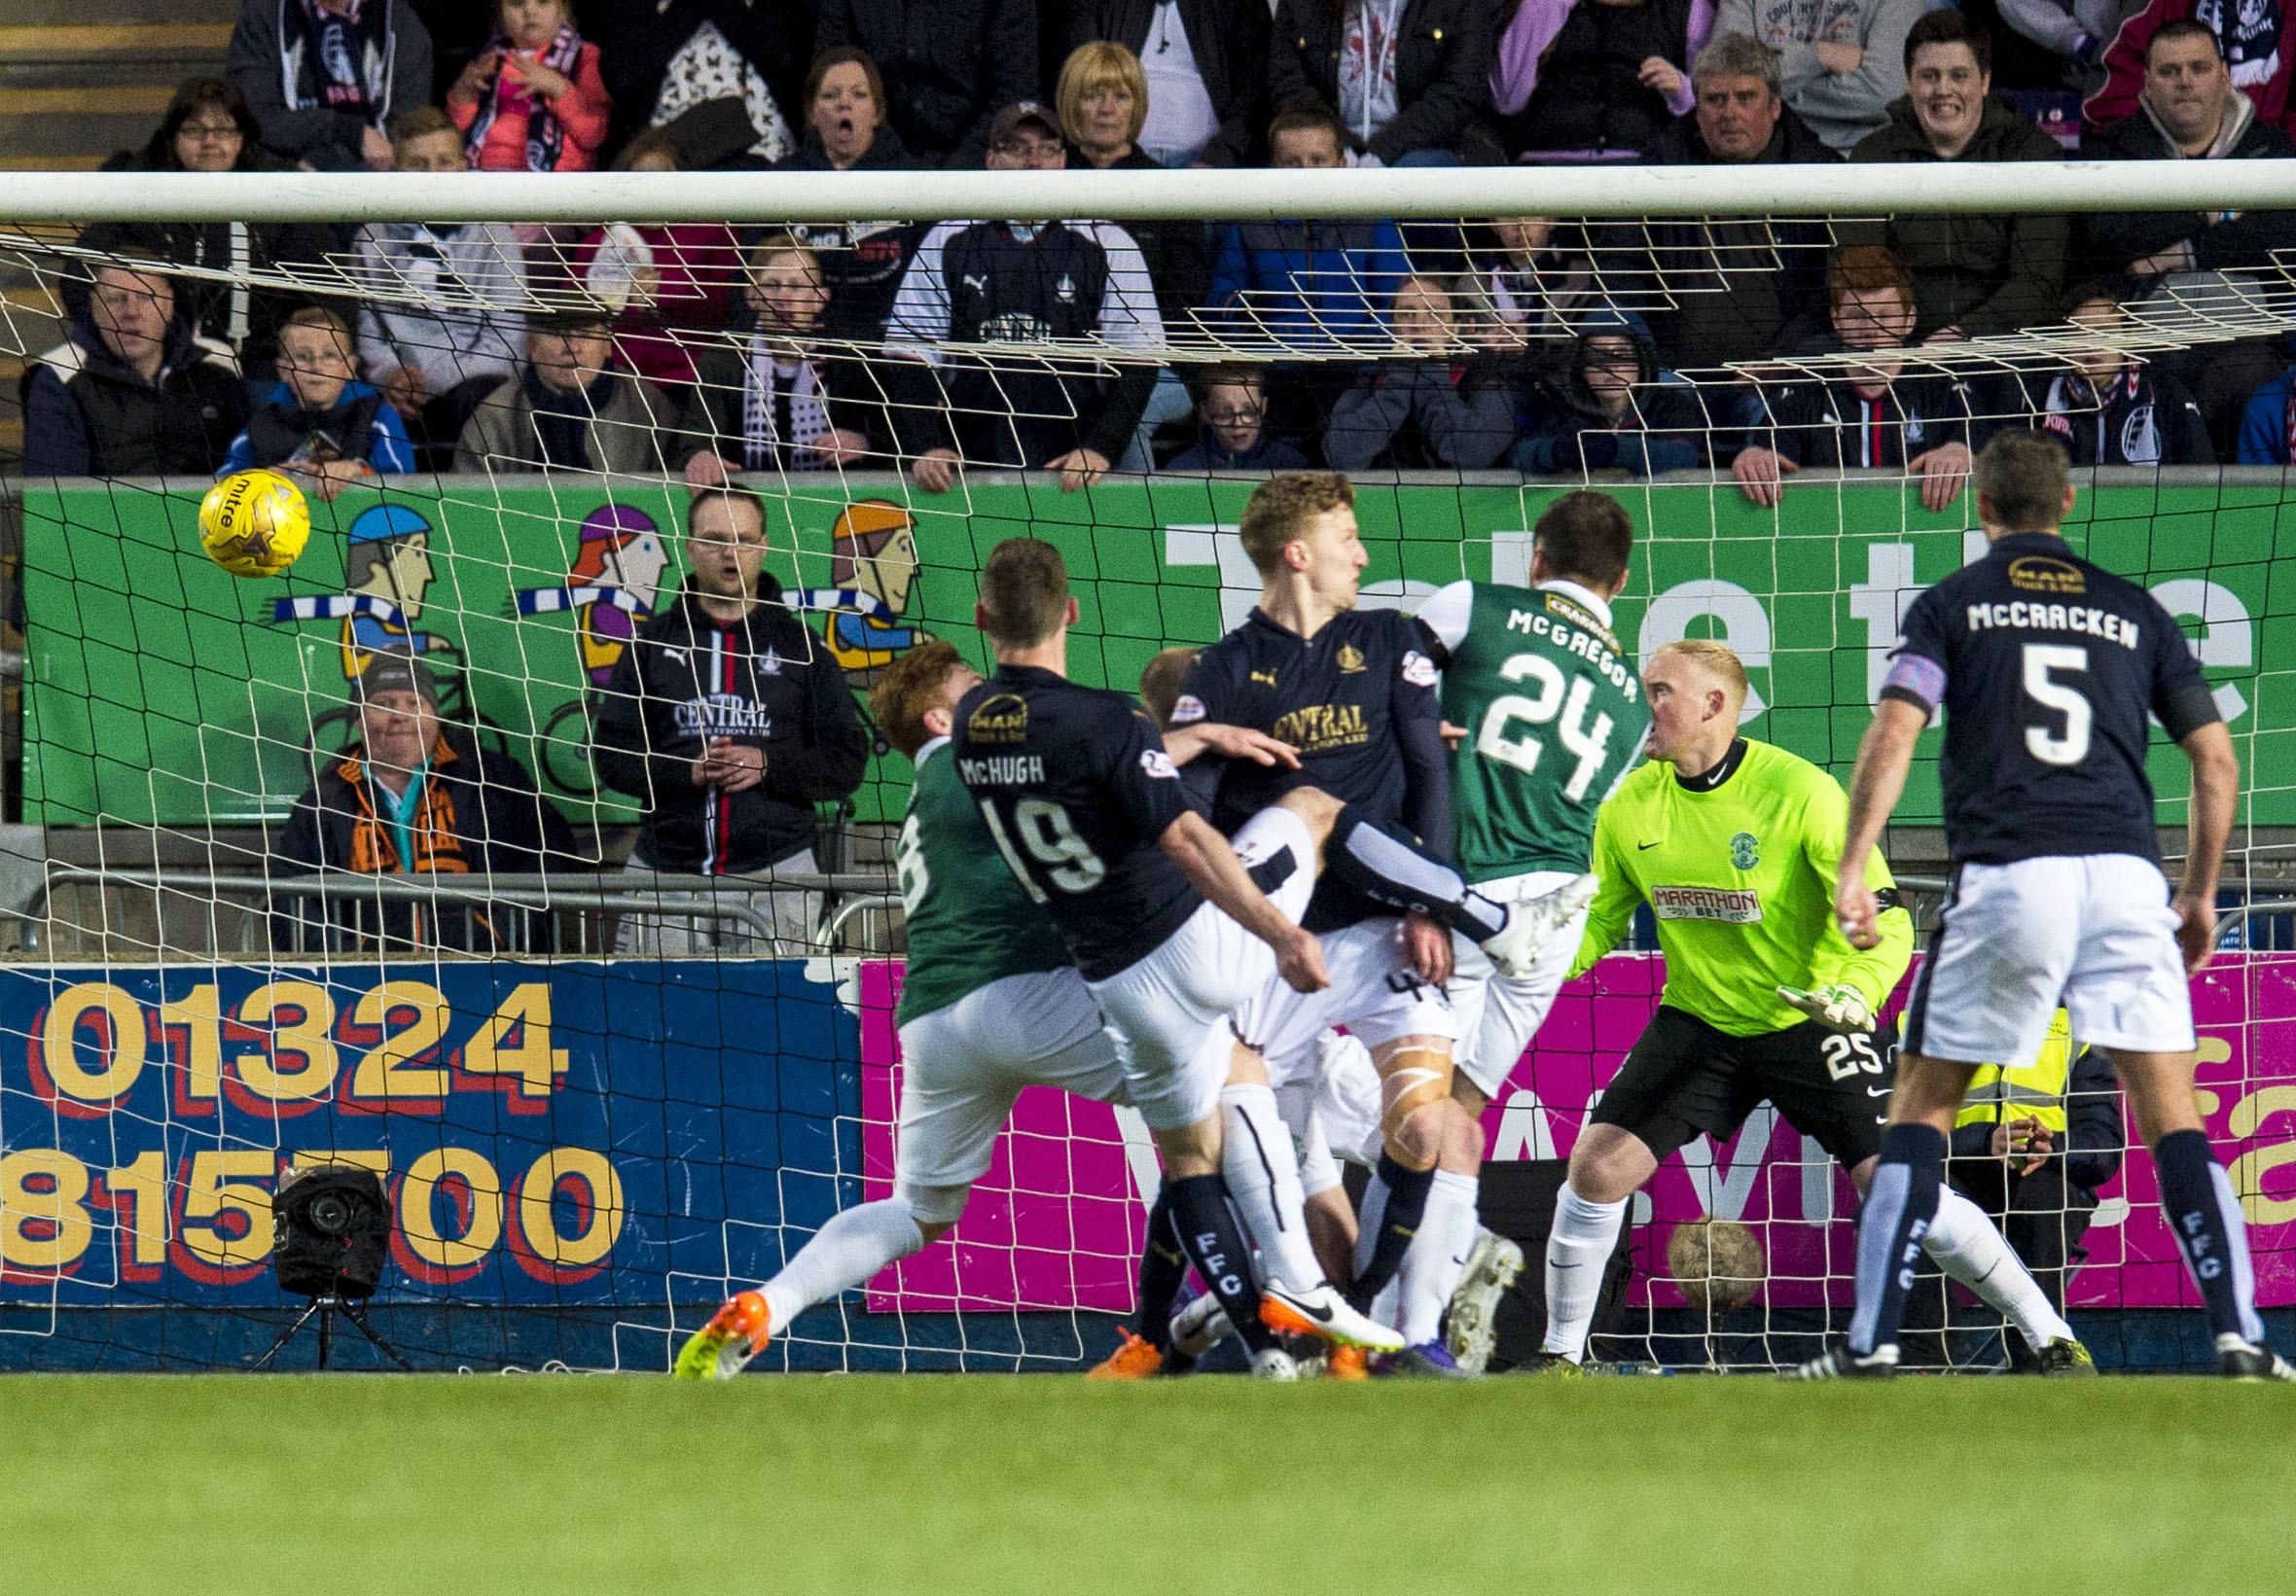 Falkirk's Bob McHugh scores his side's winning goal.